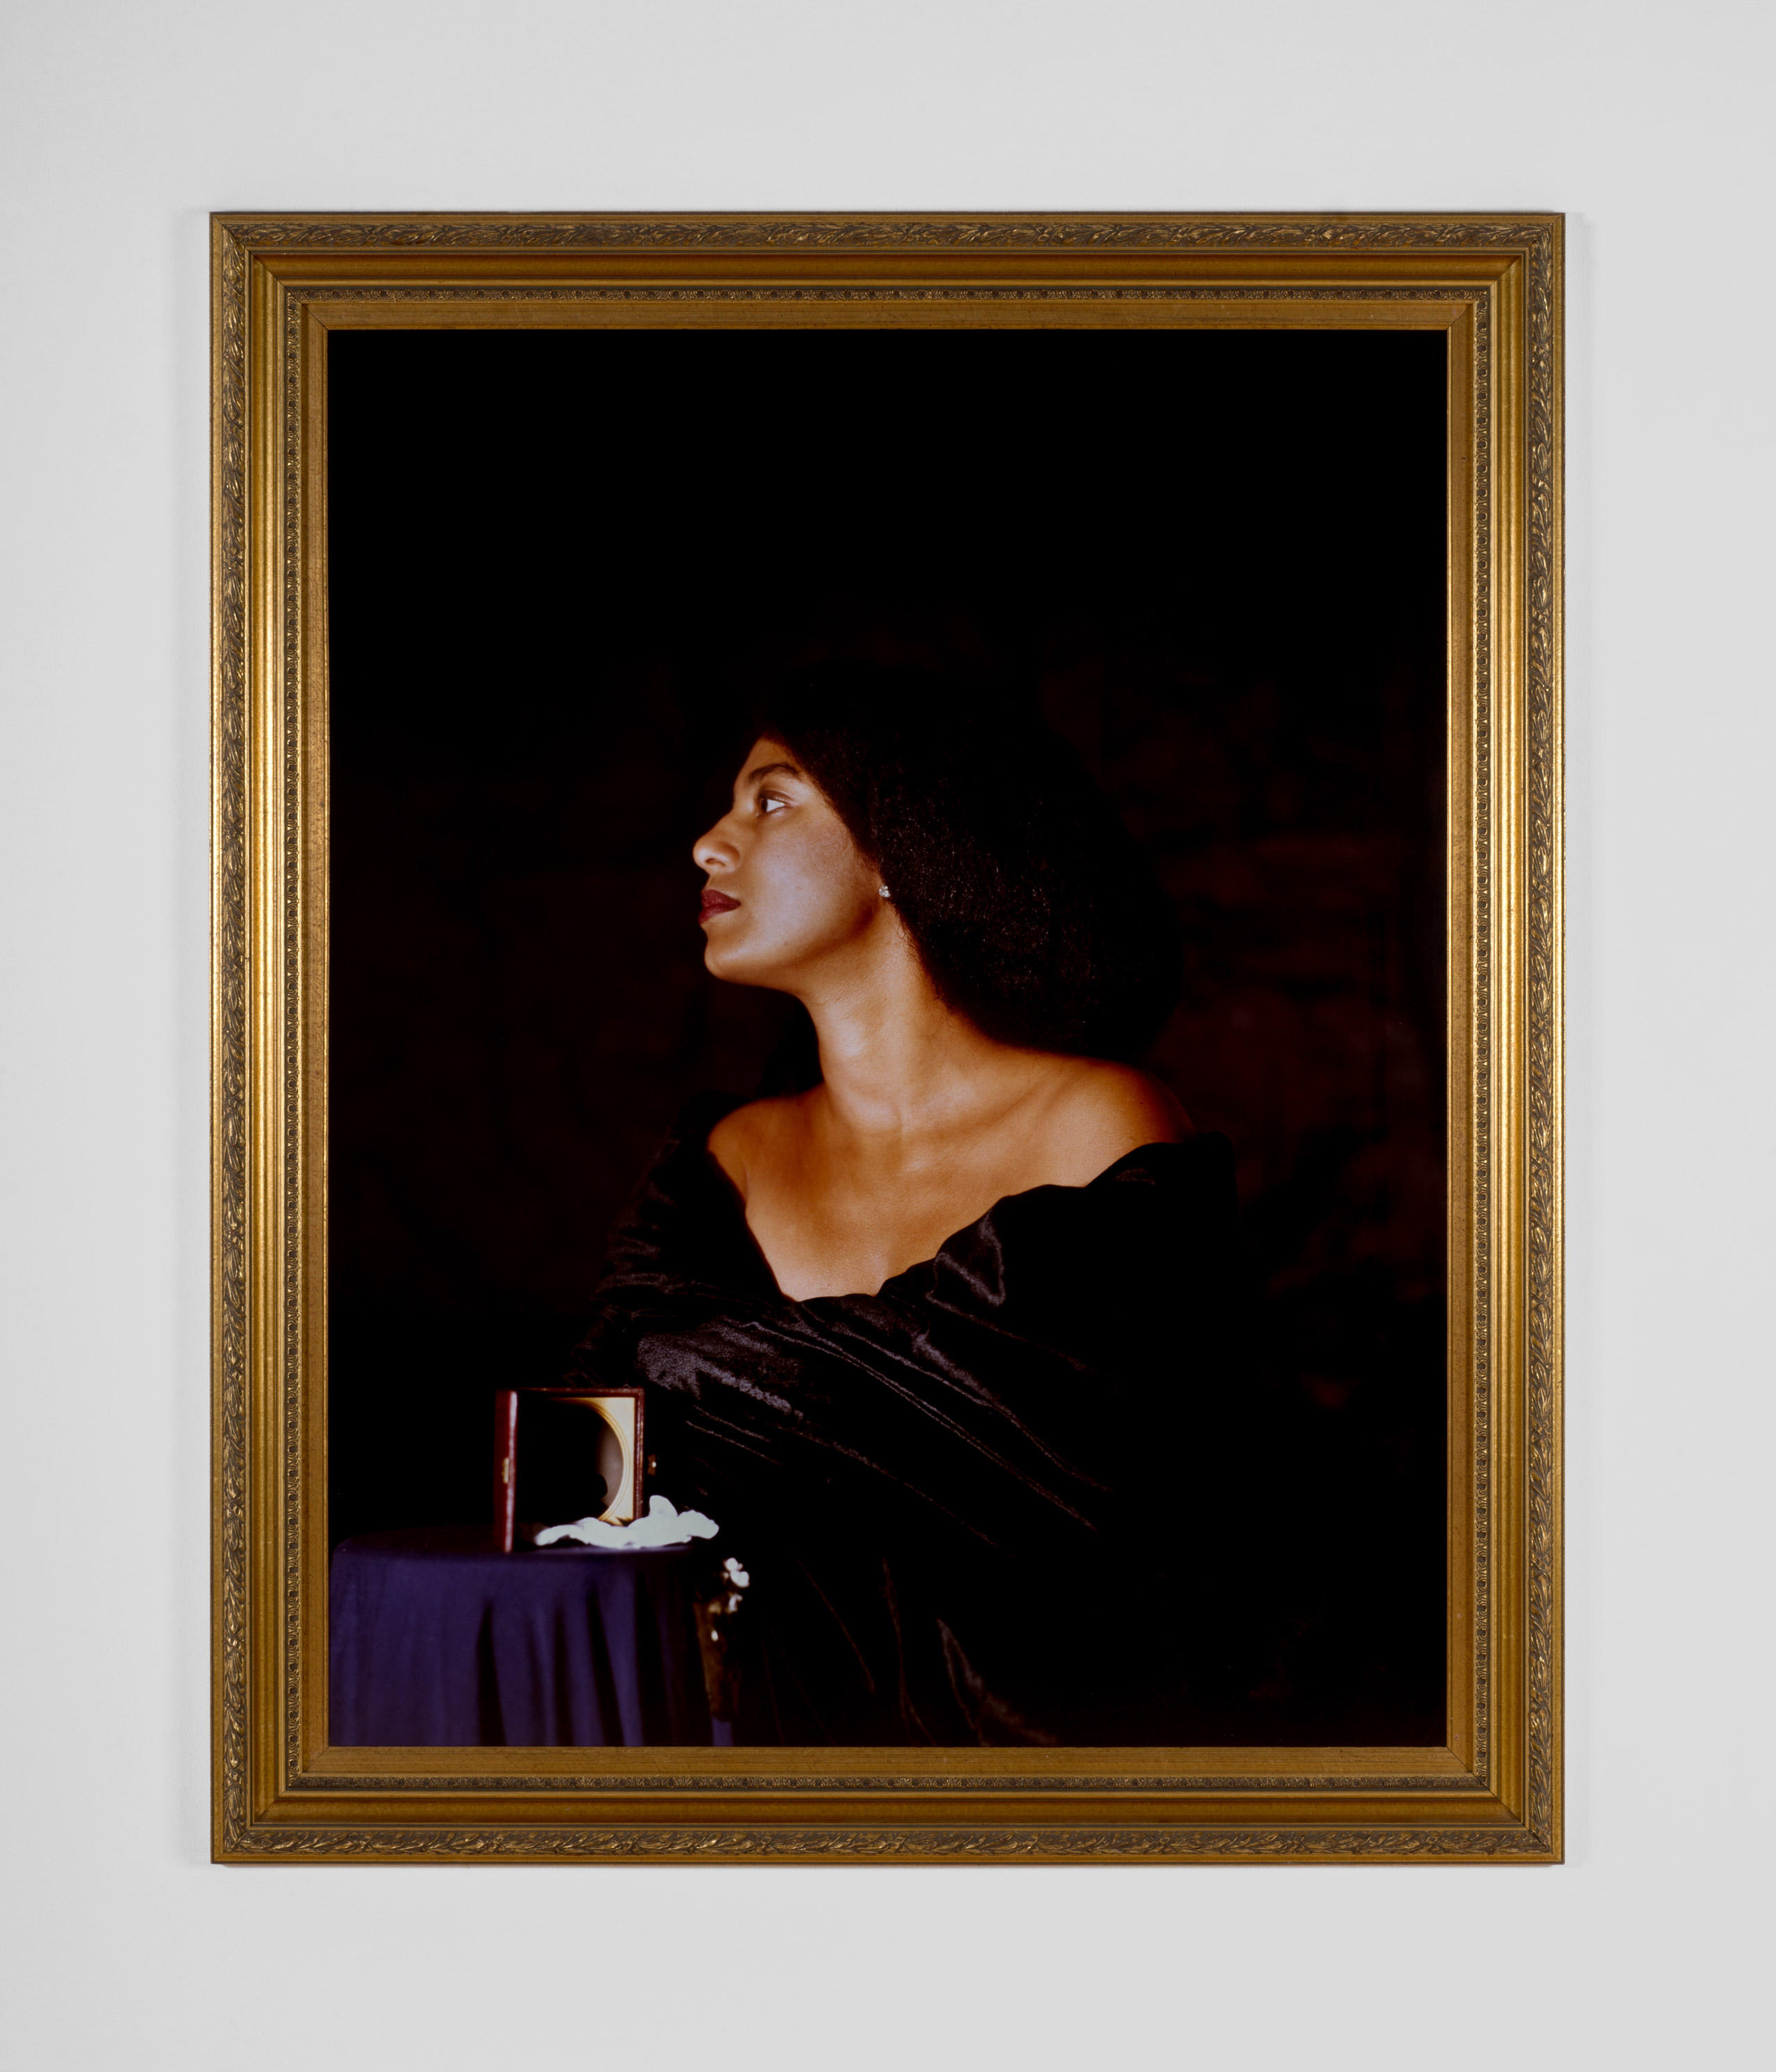 'Calliope' by Maud Sulter, 1989